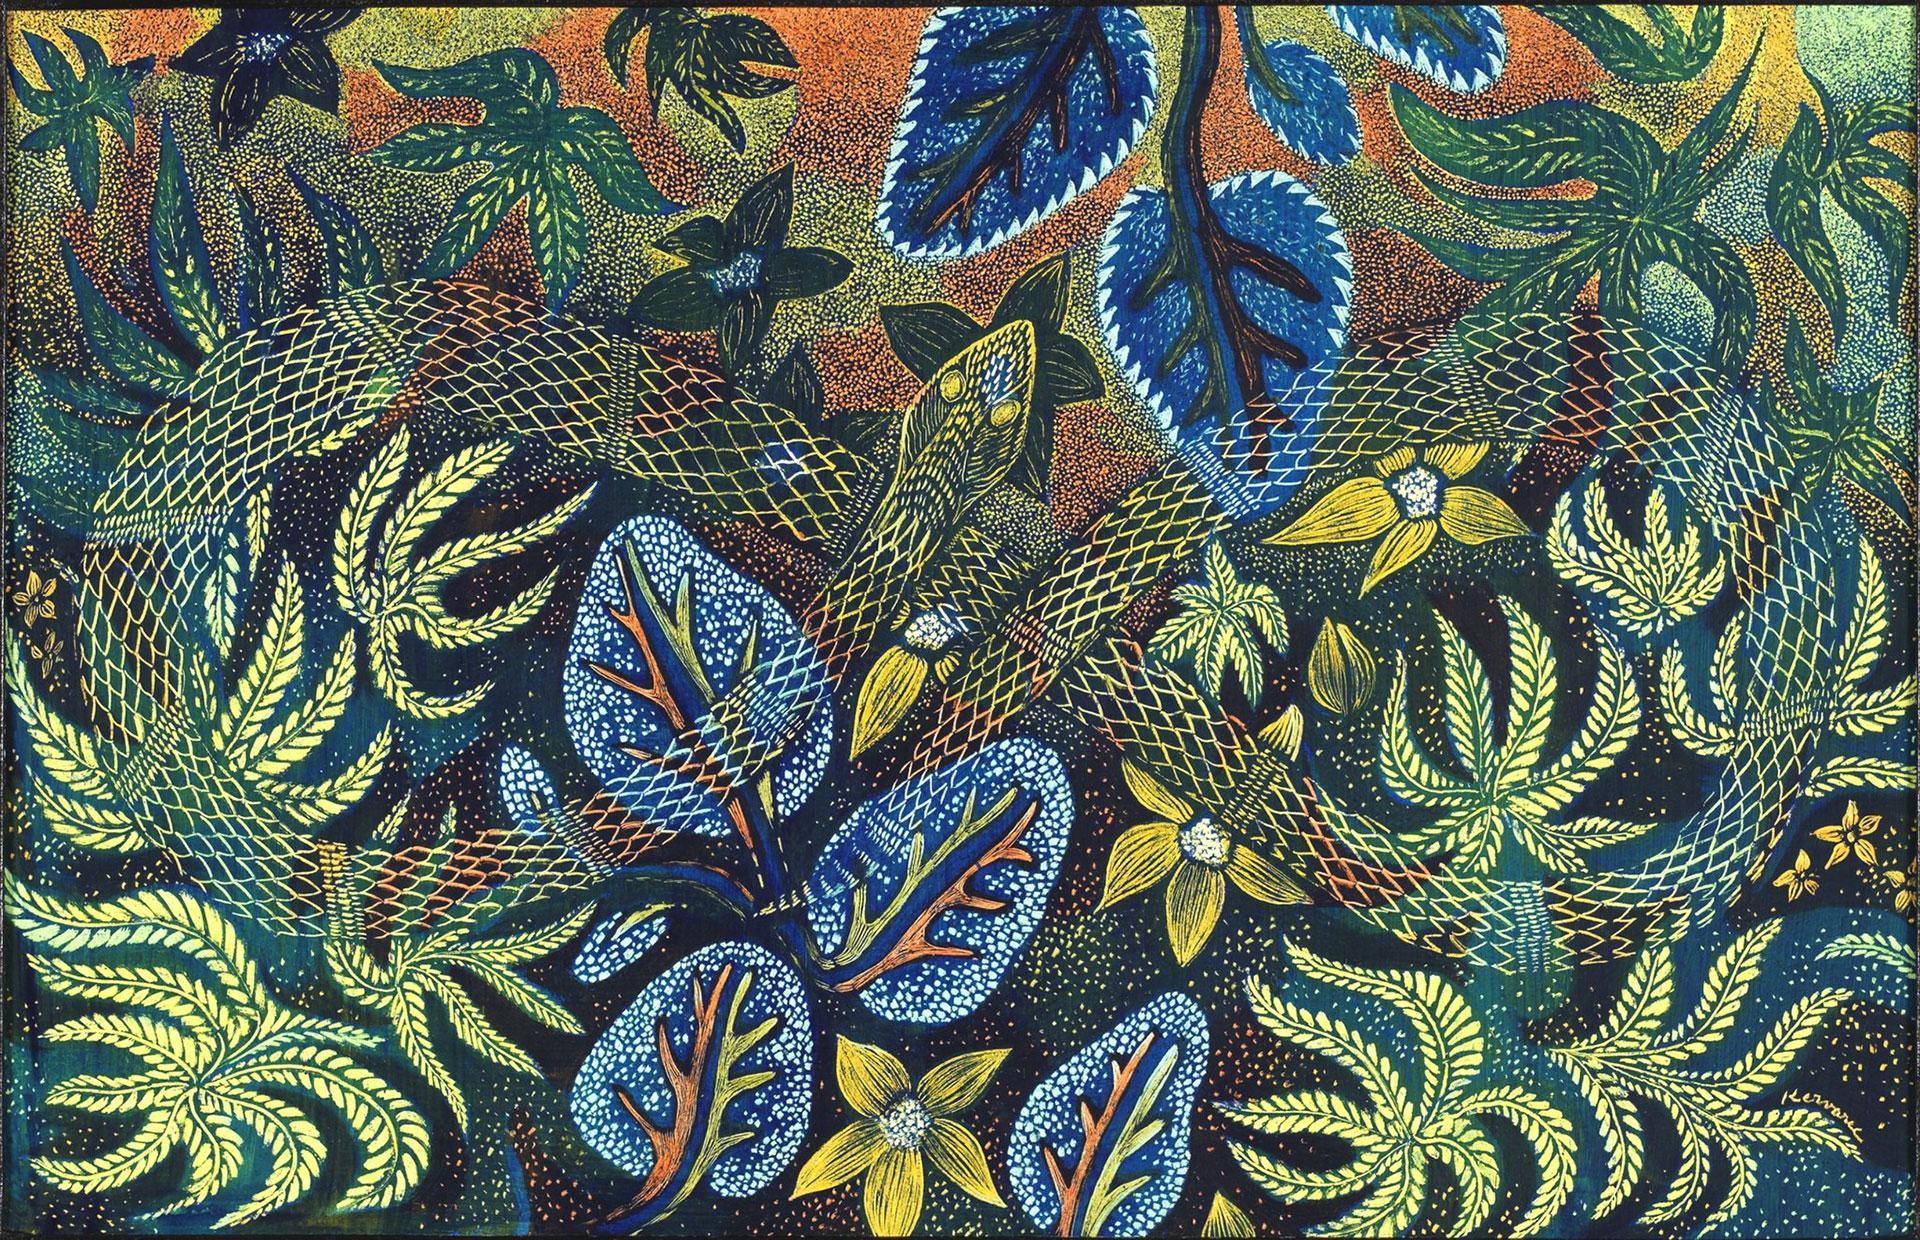 Serpent infini, Anne Kervarec artiste peintre Nantes